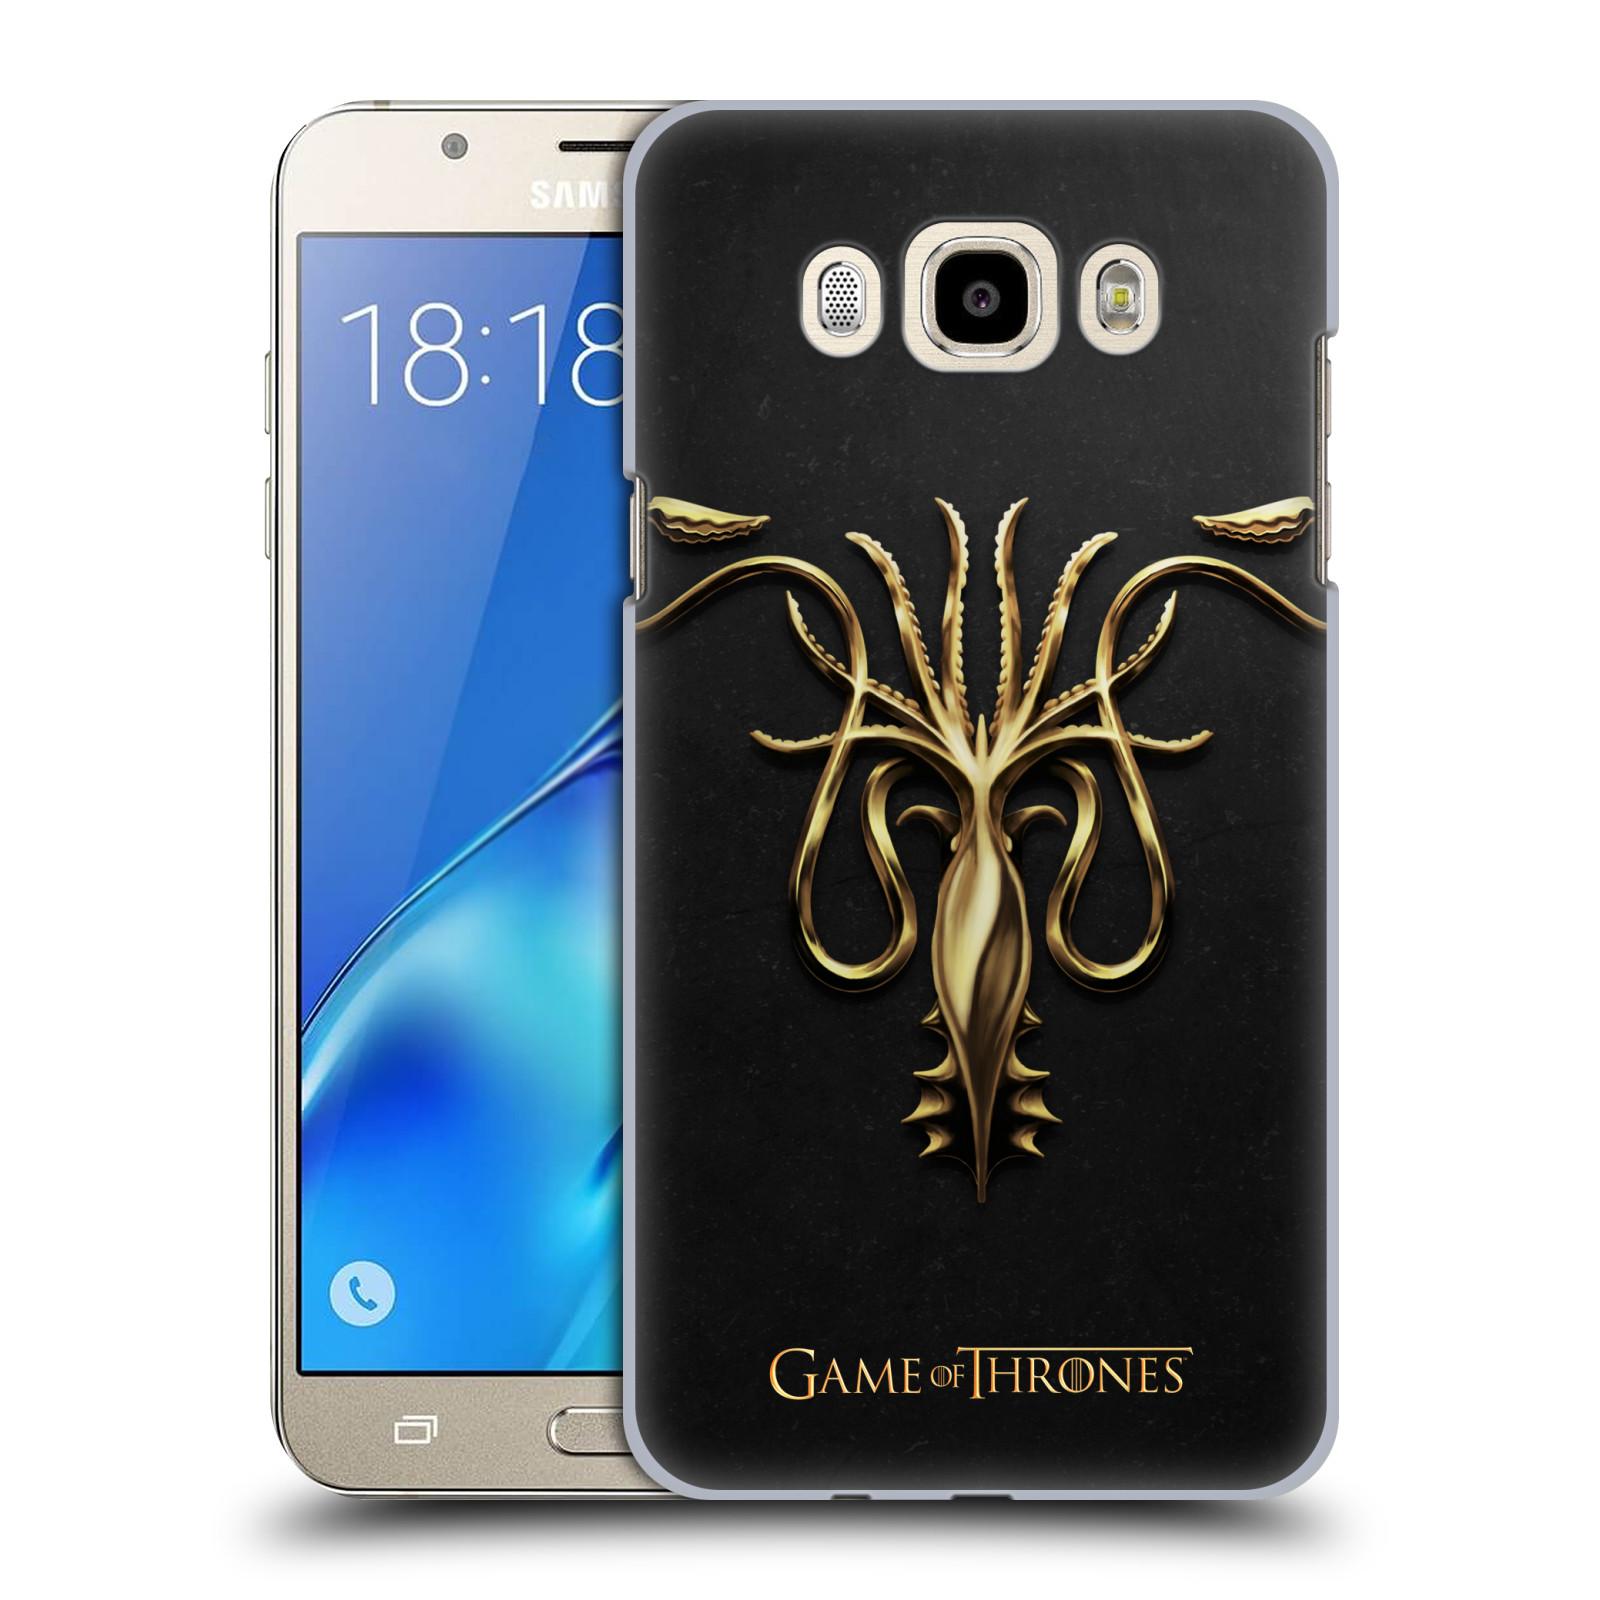 UFFICIALE-HBO-Game-of-Thrones-in-rilievo-ANGELO-HARD-BACK-CASE-per-SAMSUNG-telefoni-3